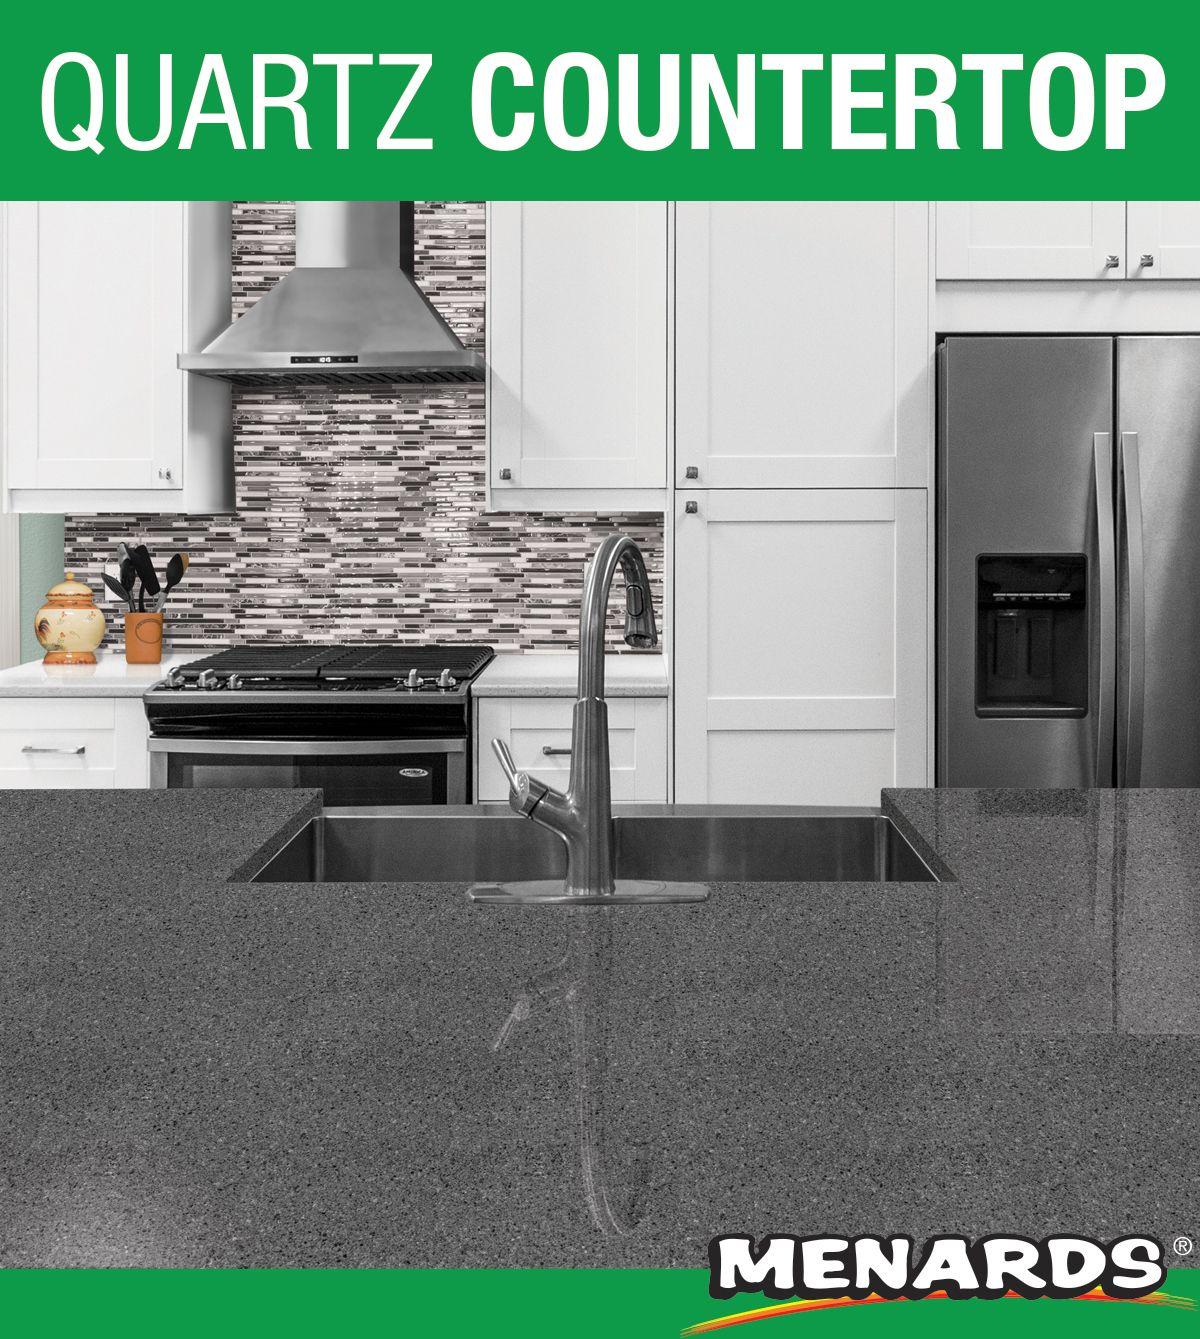 riverstone quartz countertops under